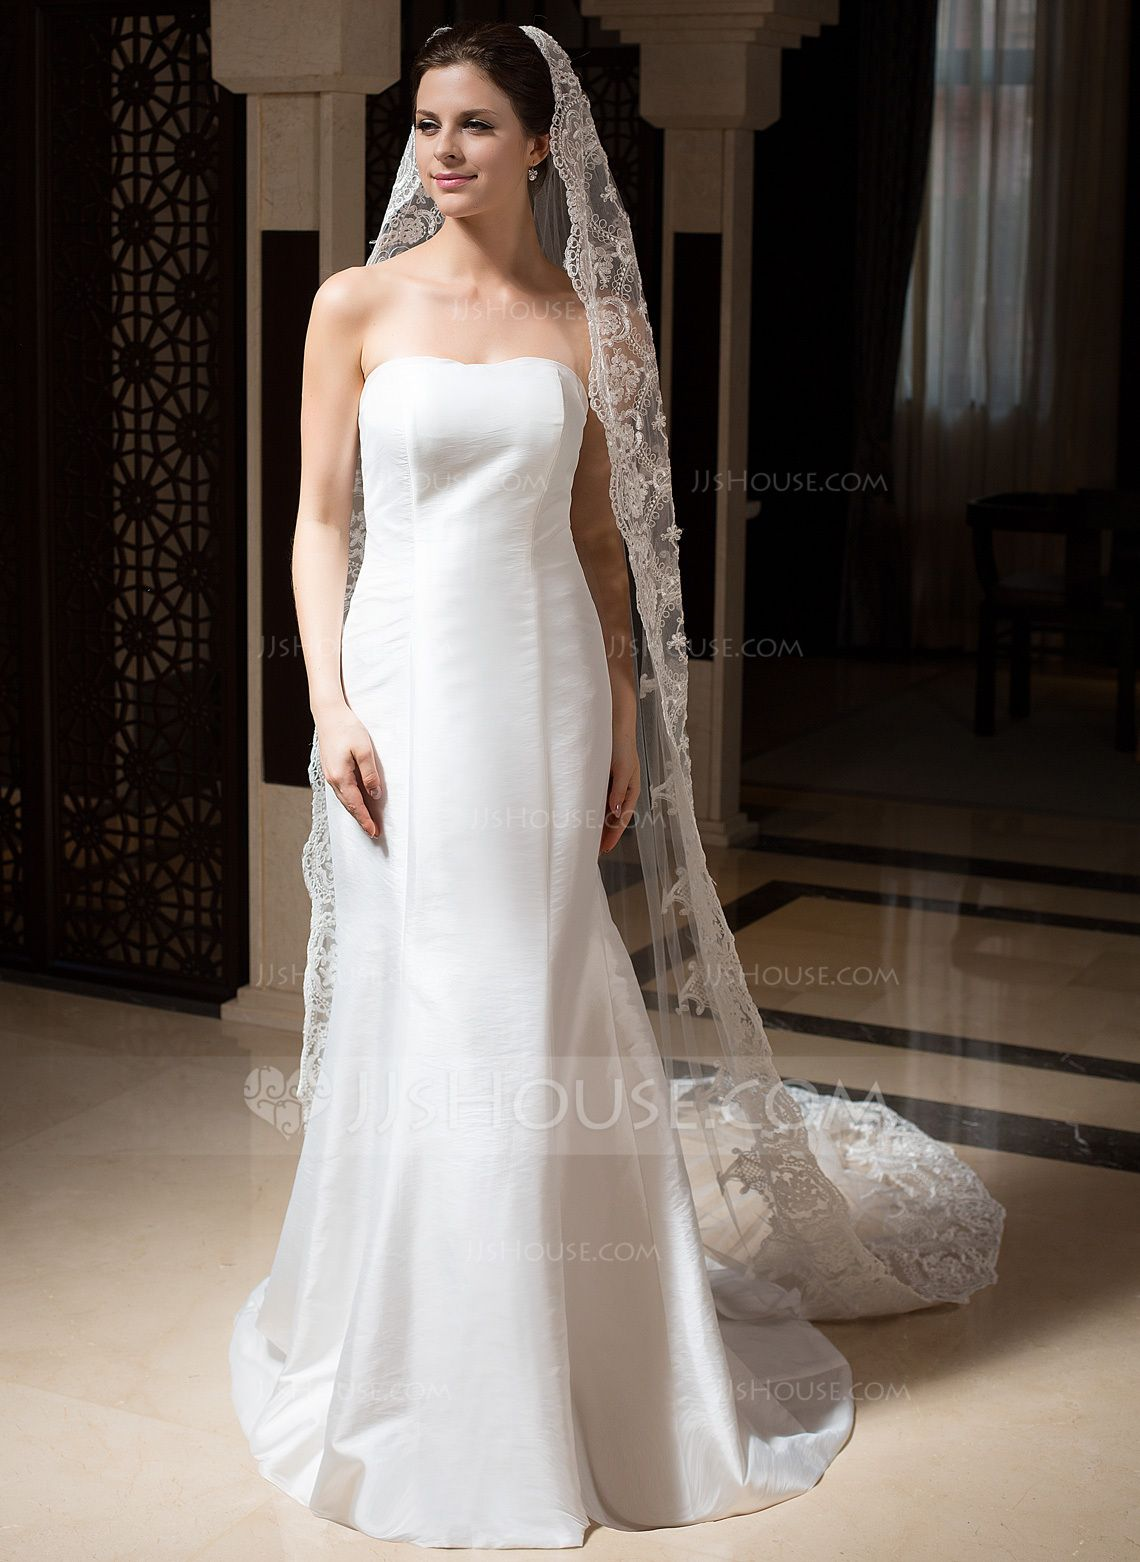 Cathedral bridal veils tulle onetier drop veil lace applique edge